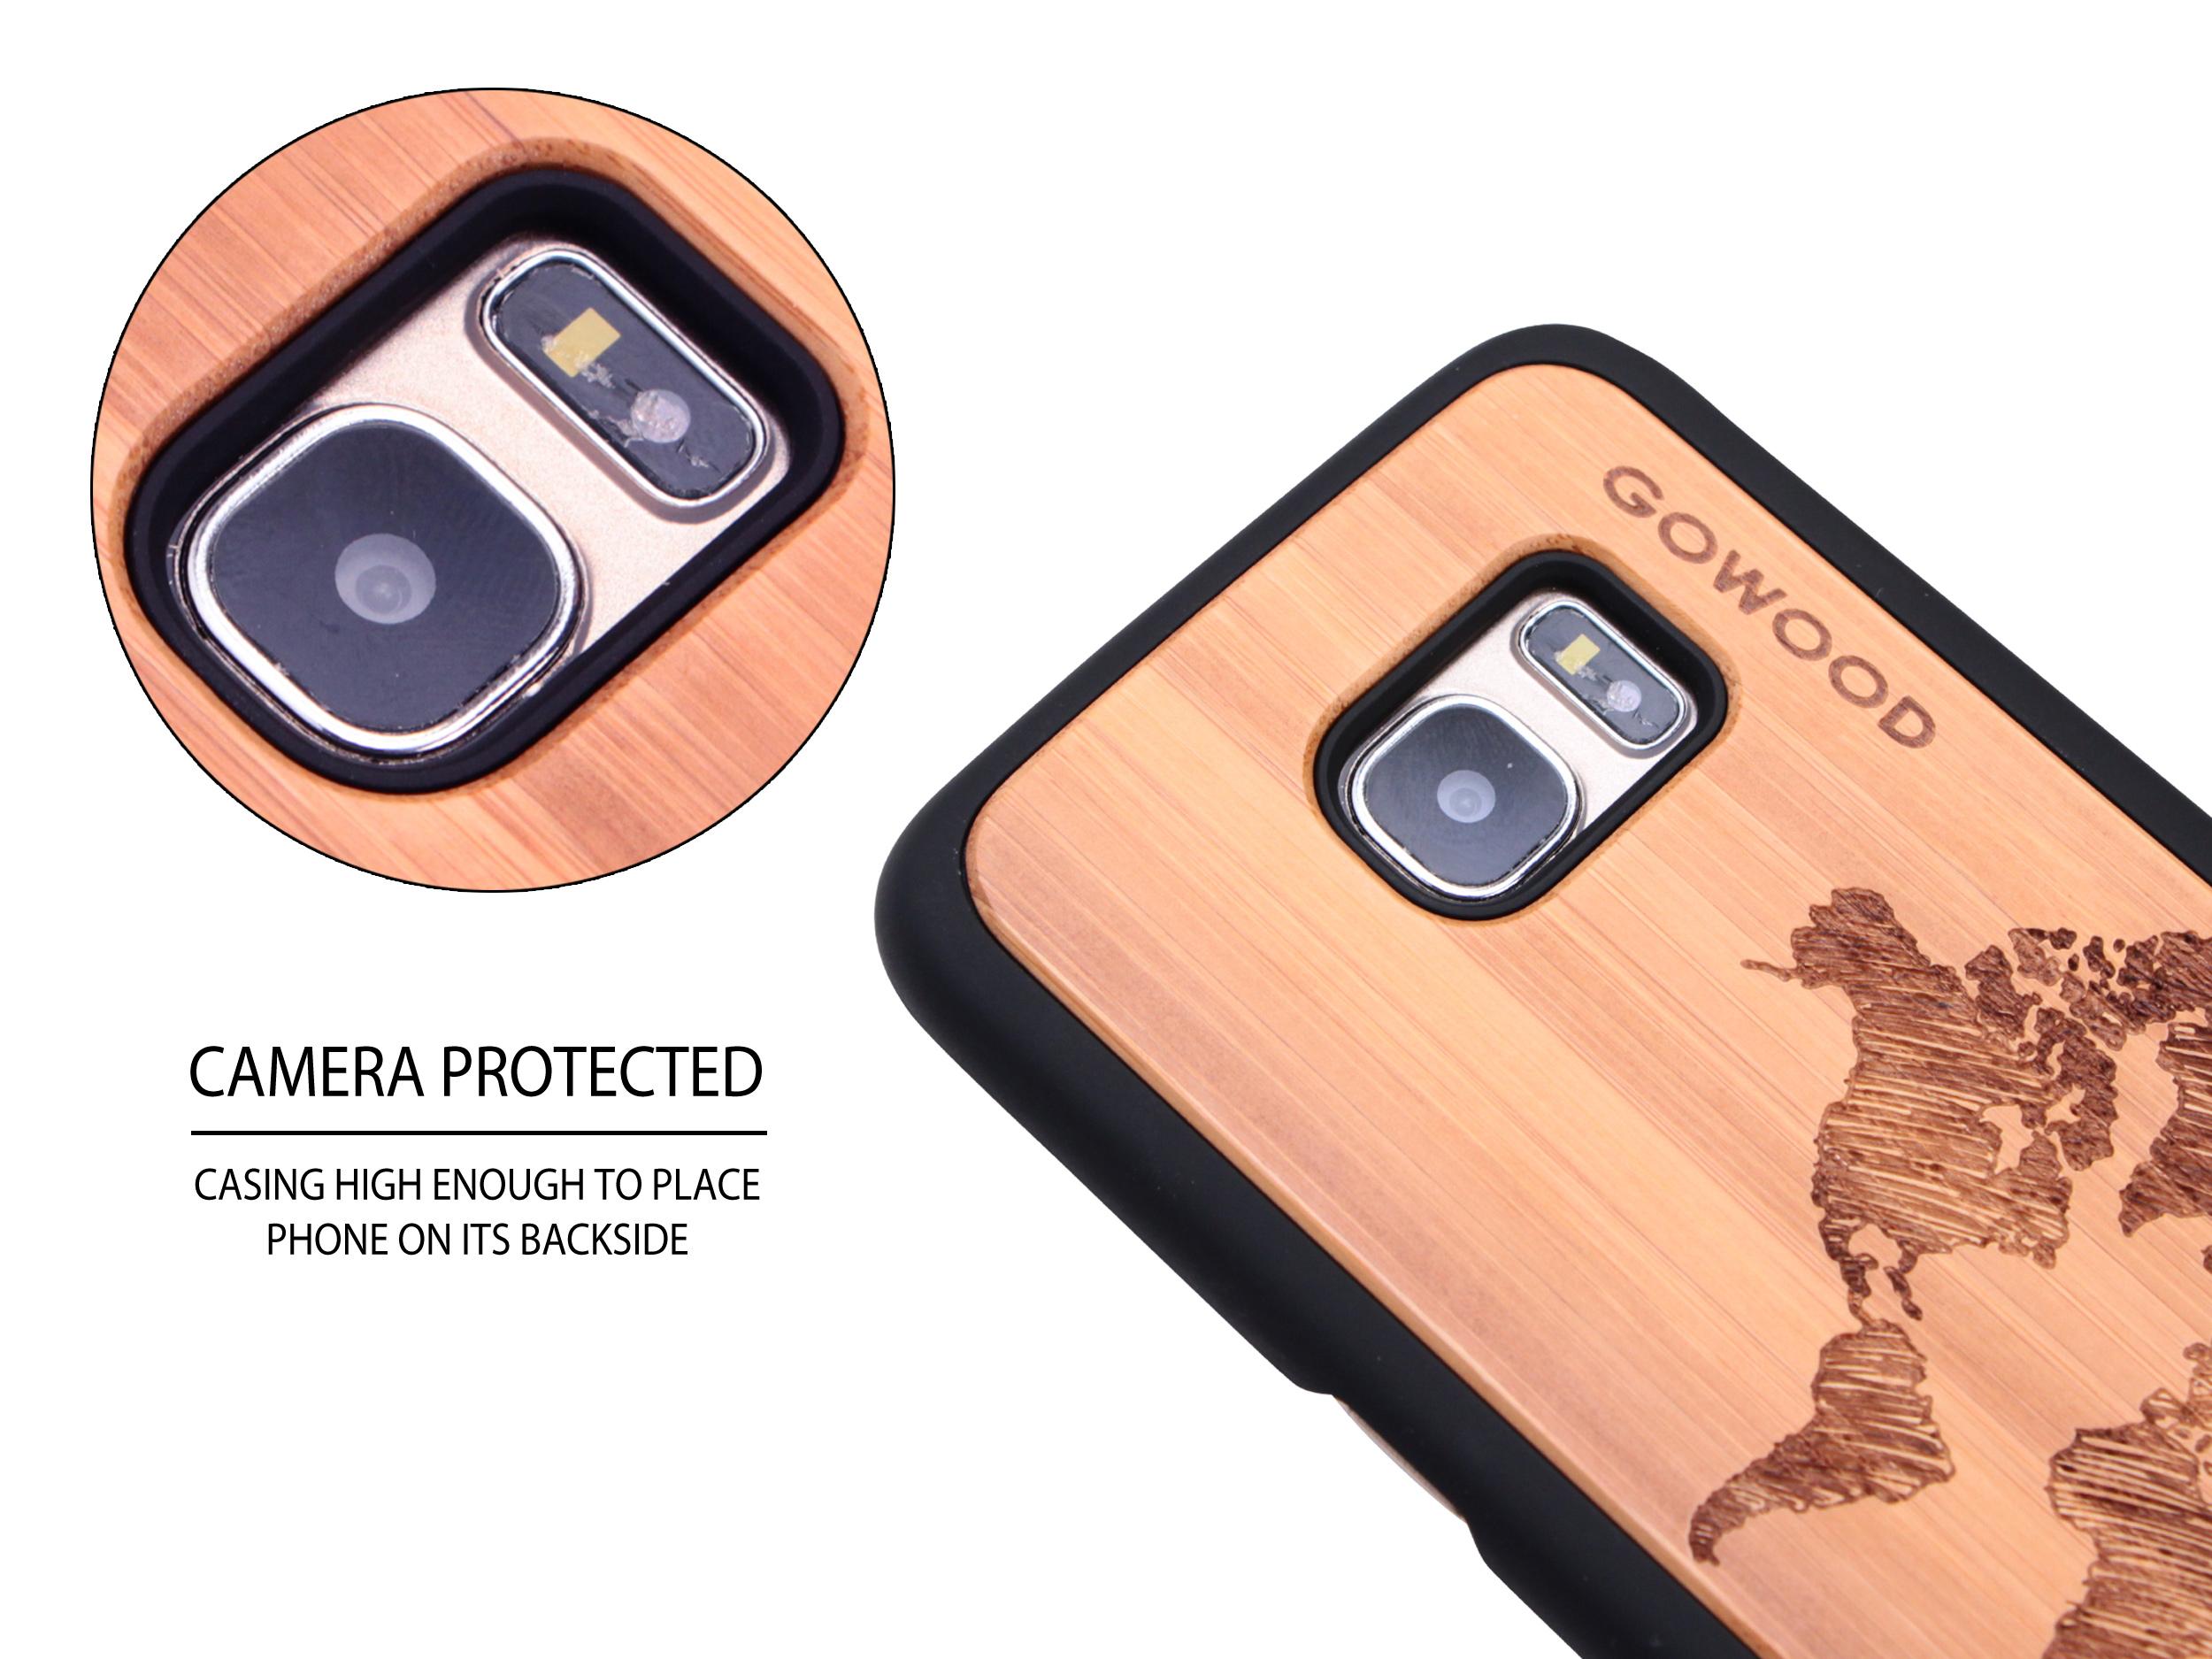 Samsung Galaxy S7 Edge wood case world map camera